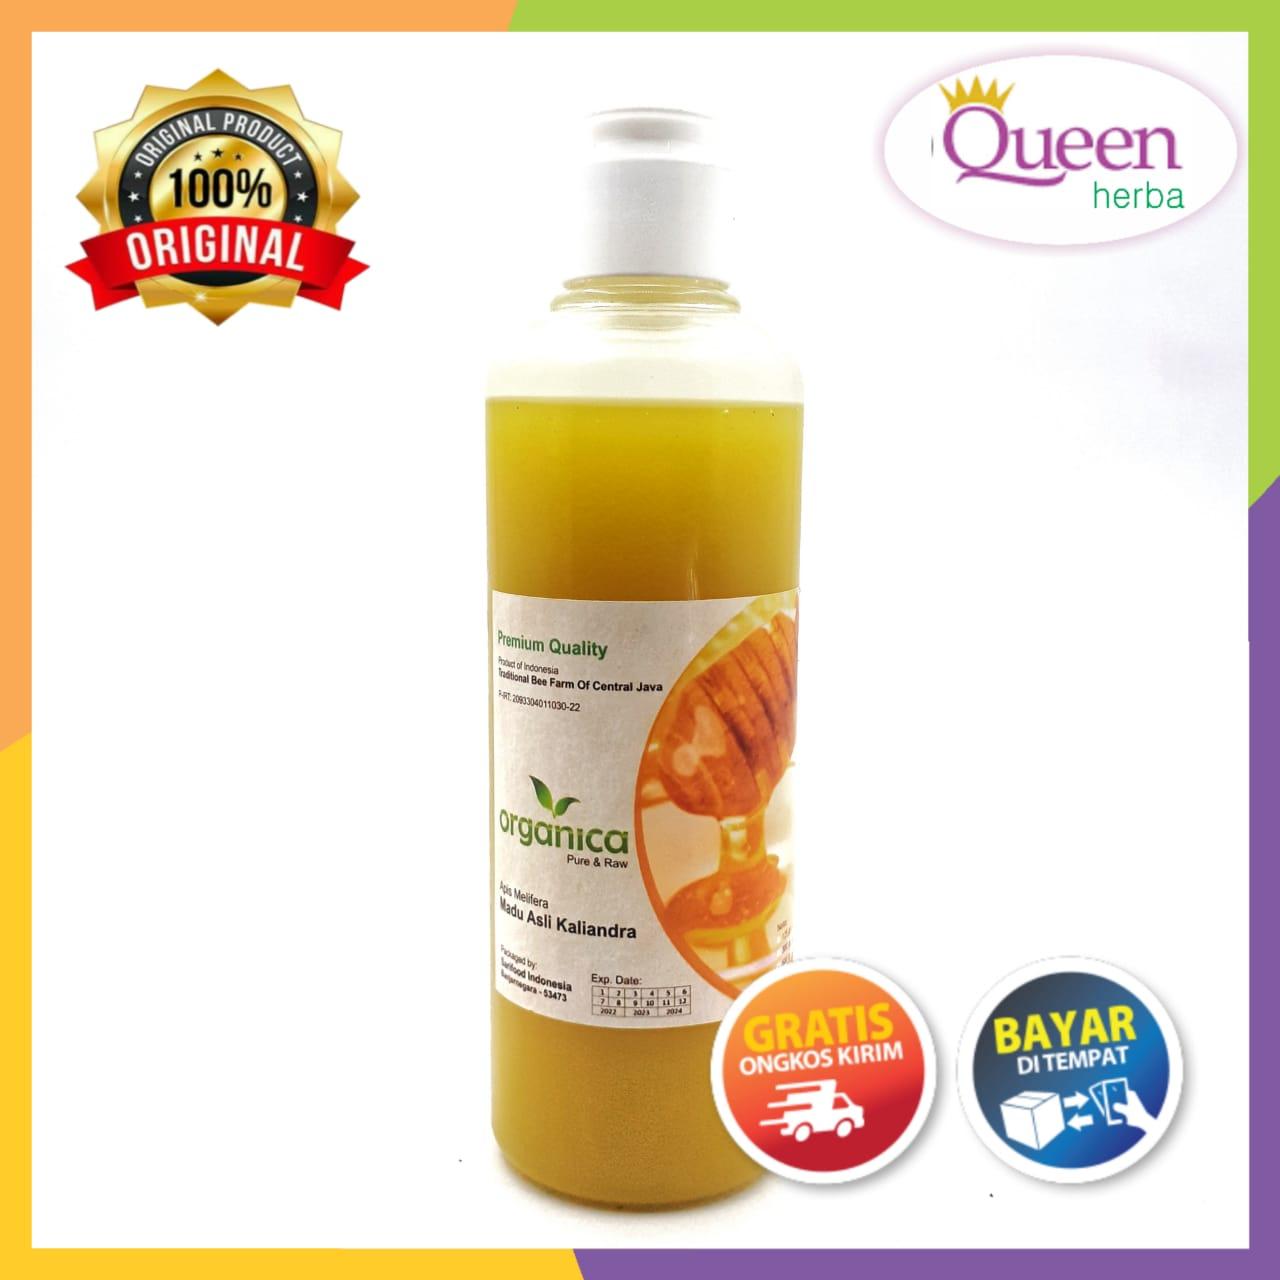 madu kaliandra murni – madu asli bunga kaliandra – madu raw kaliandra – madu bunga kaliandra 300 gr – queen herba